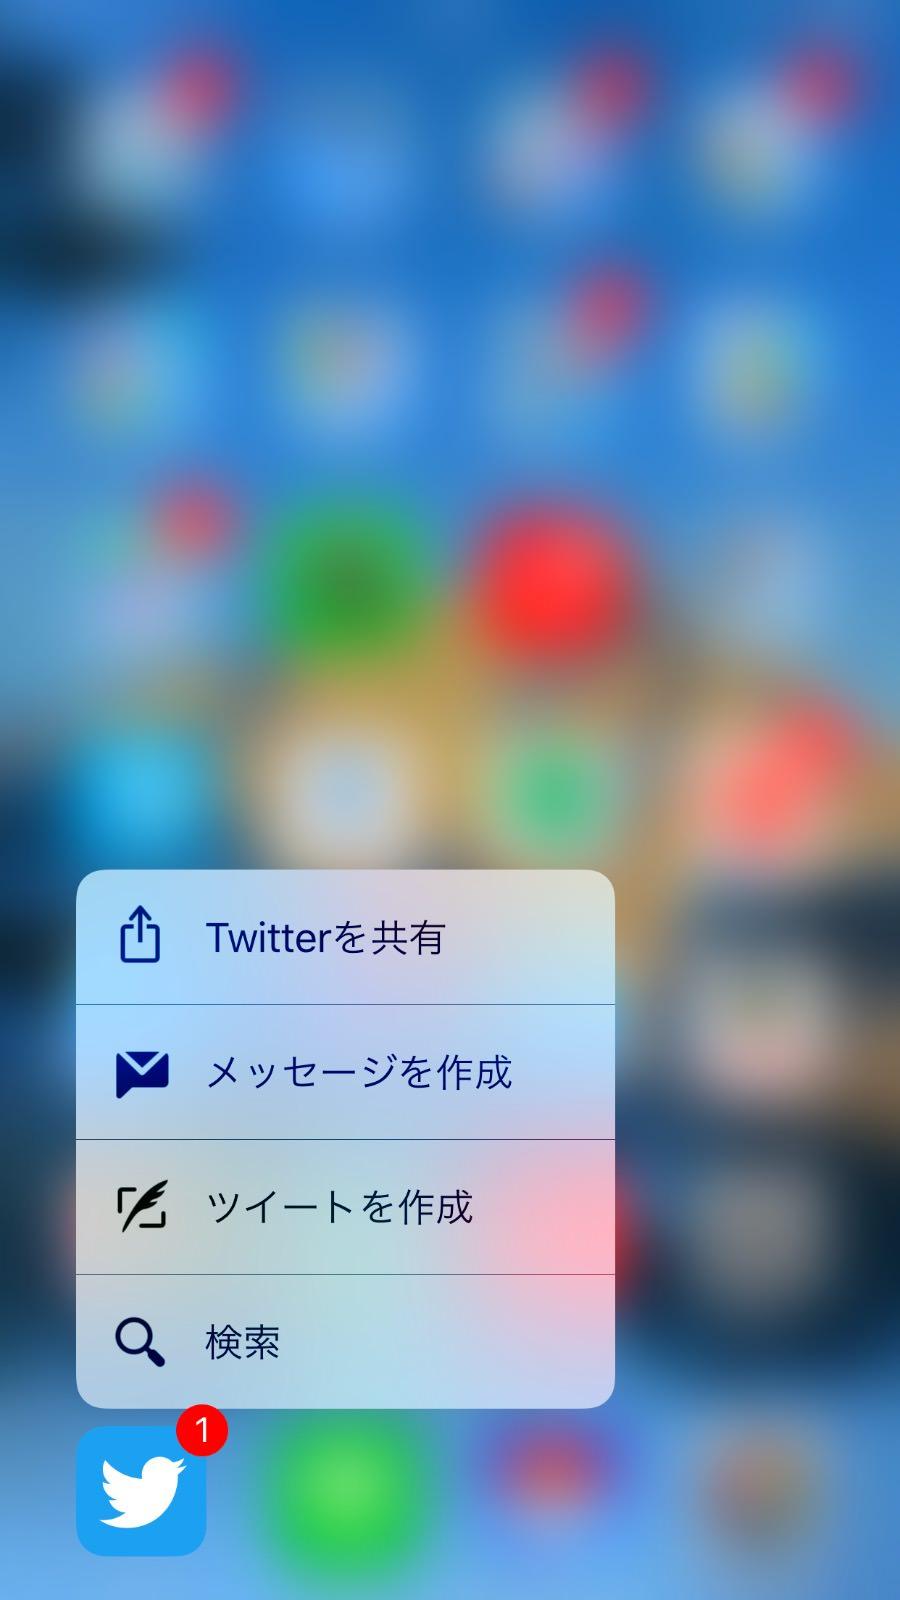 「iPhone 7/7 Plus」から始める3D Touch(3Dタッチ)の話